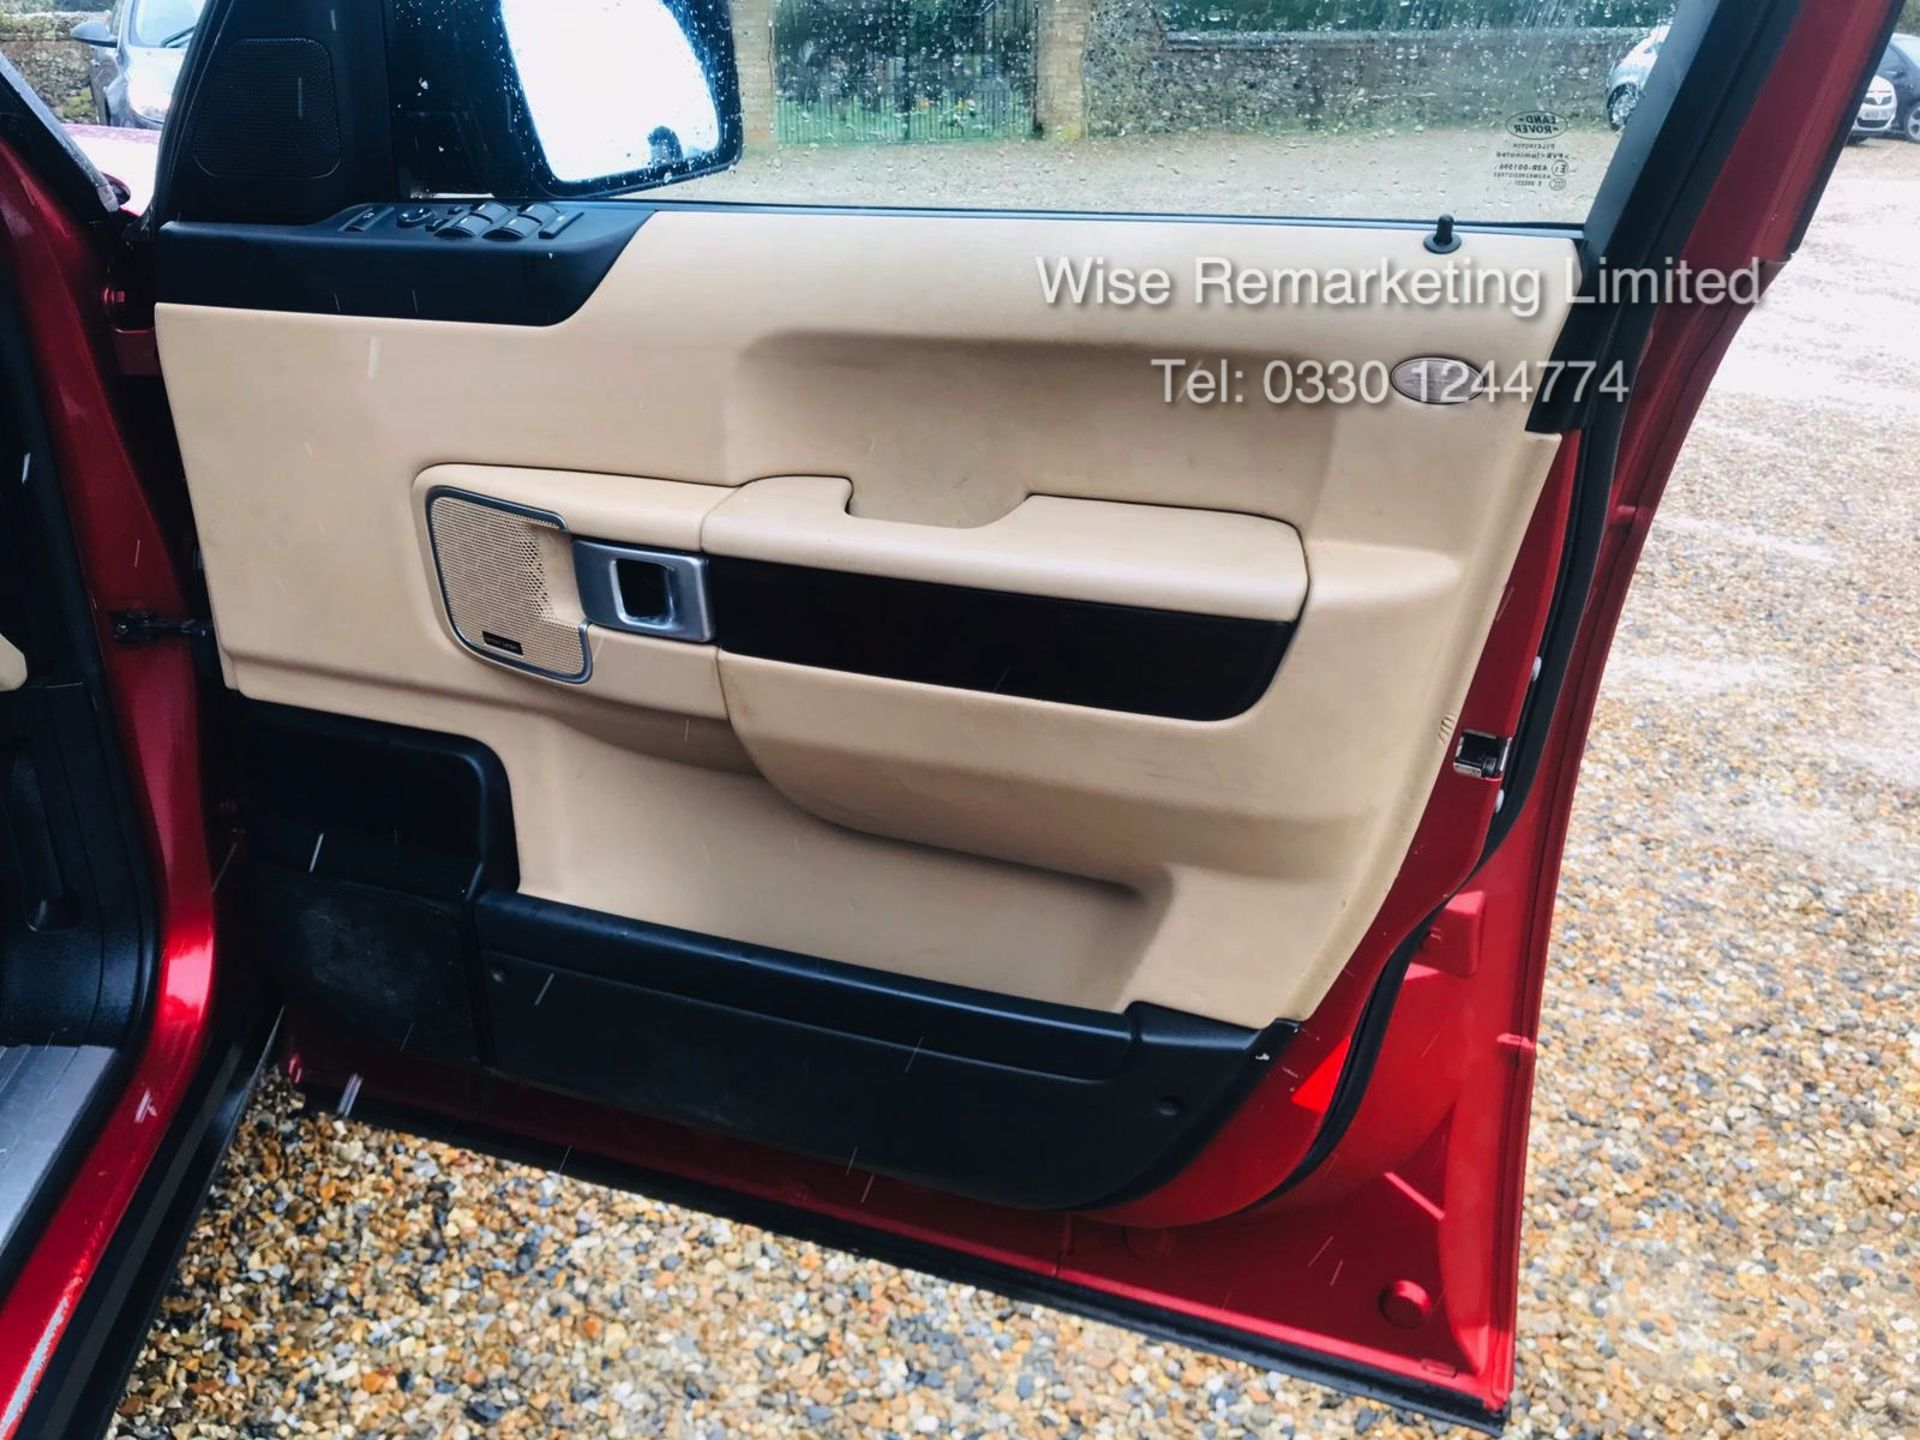 Range Rover Vogue 3.6 TDV8 HSE Auto - 2010 Model - Cream Leather - Service History - - Image 24 of 28